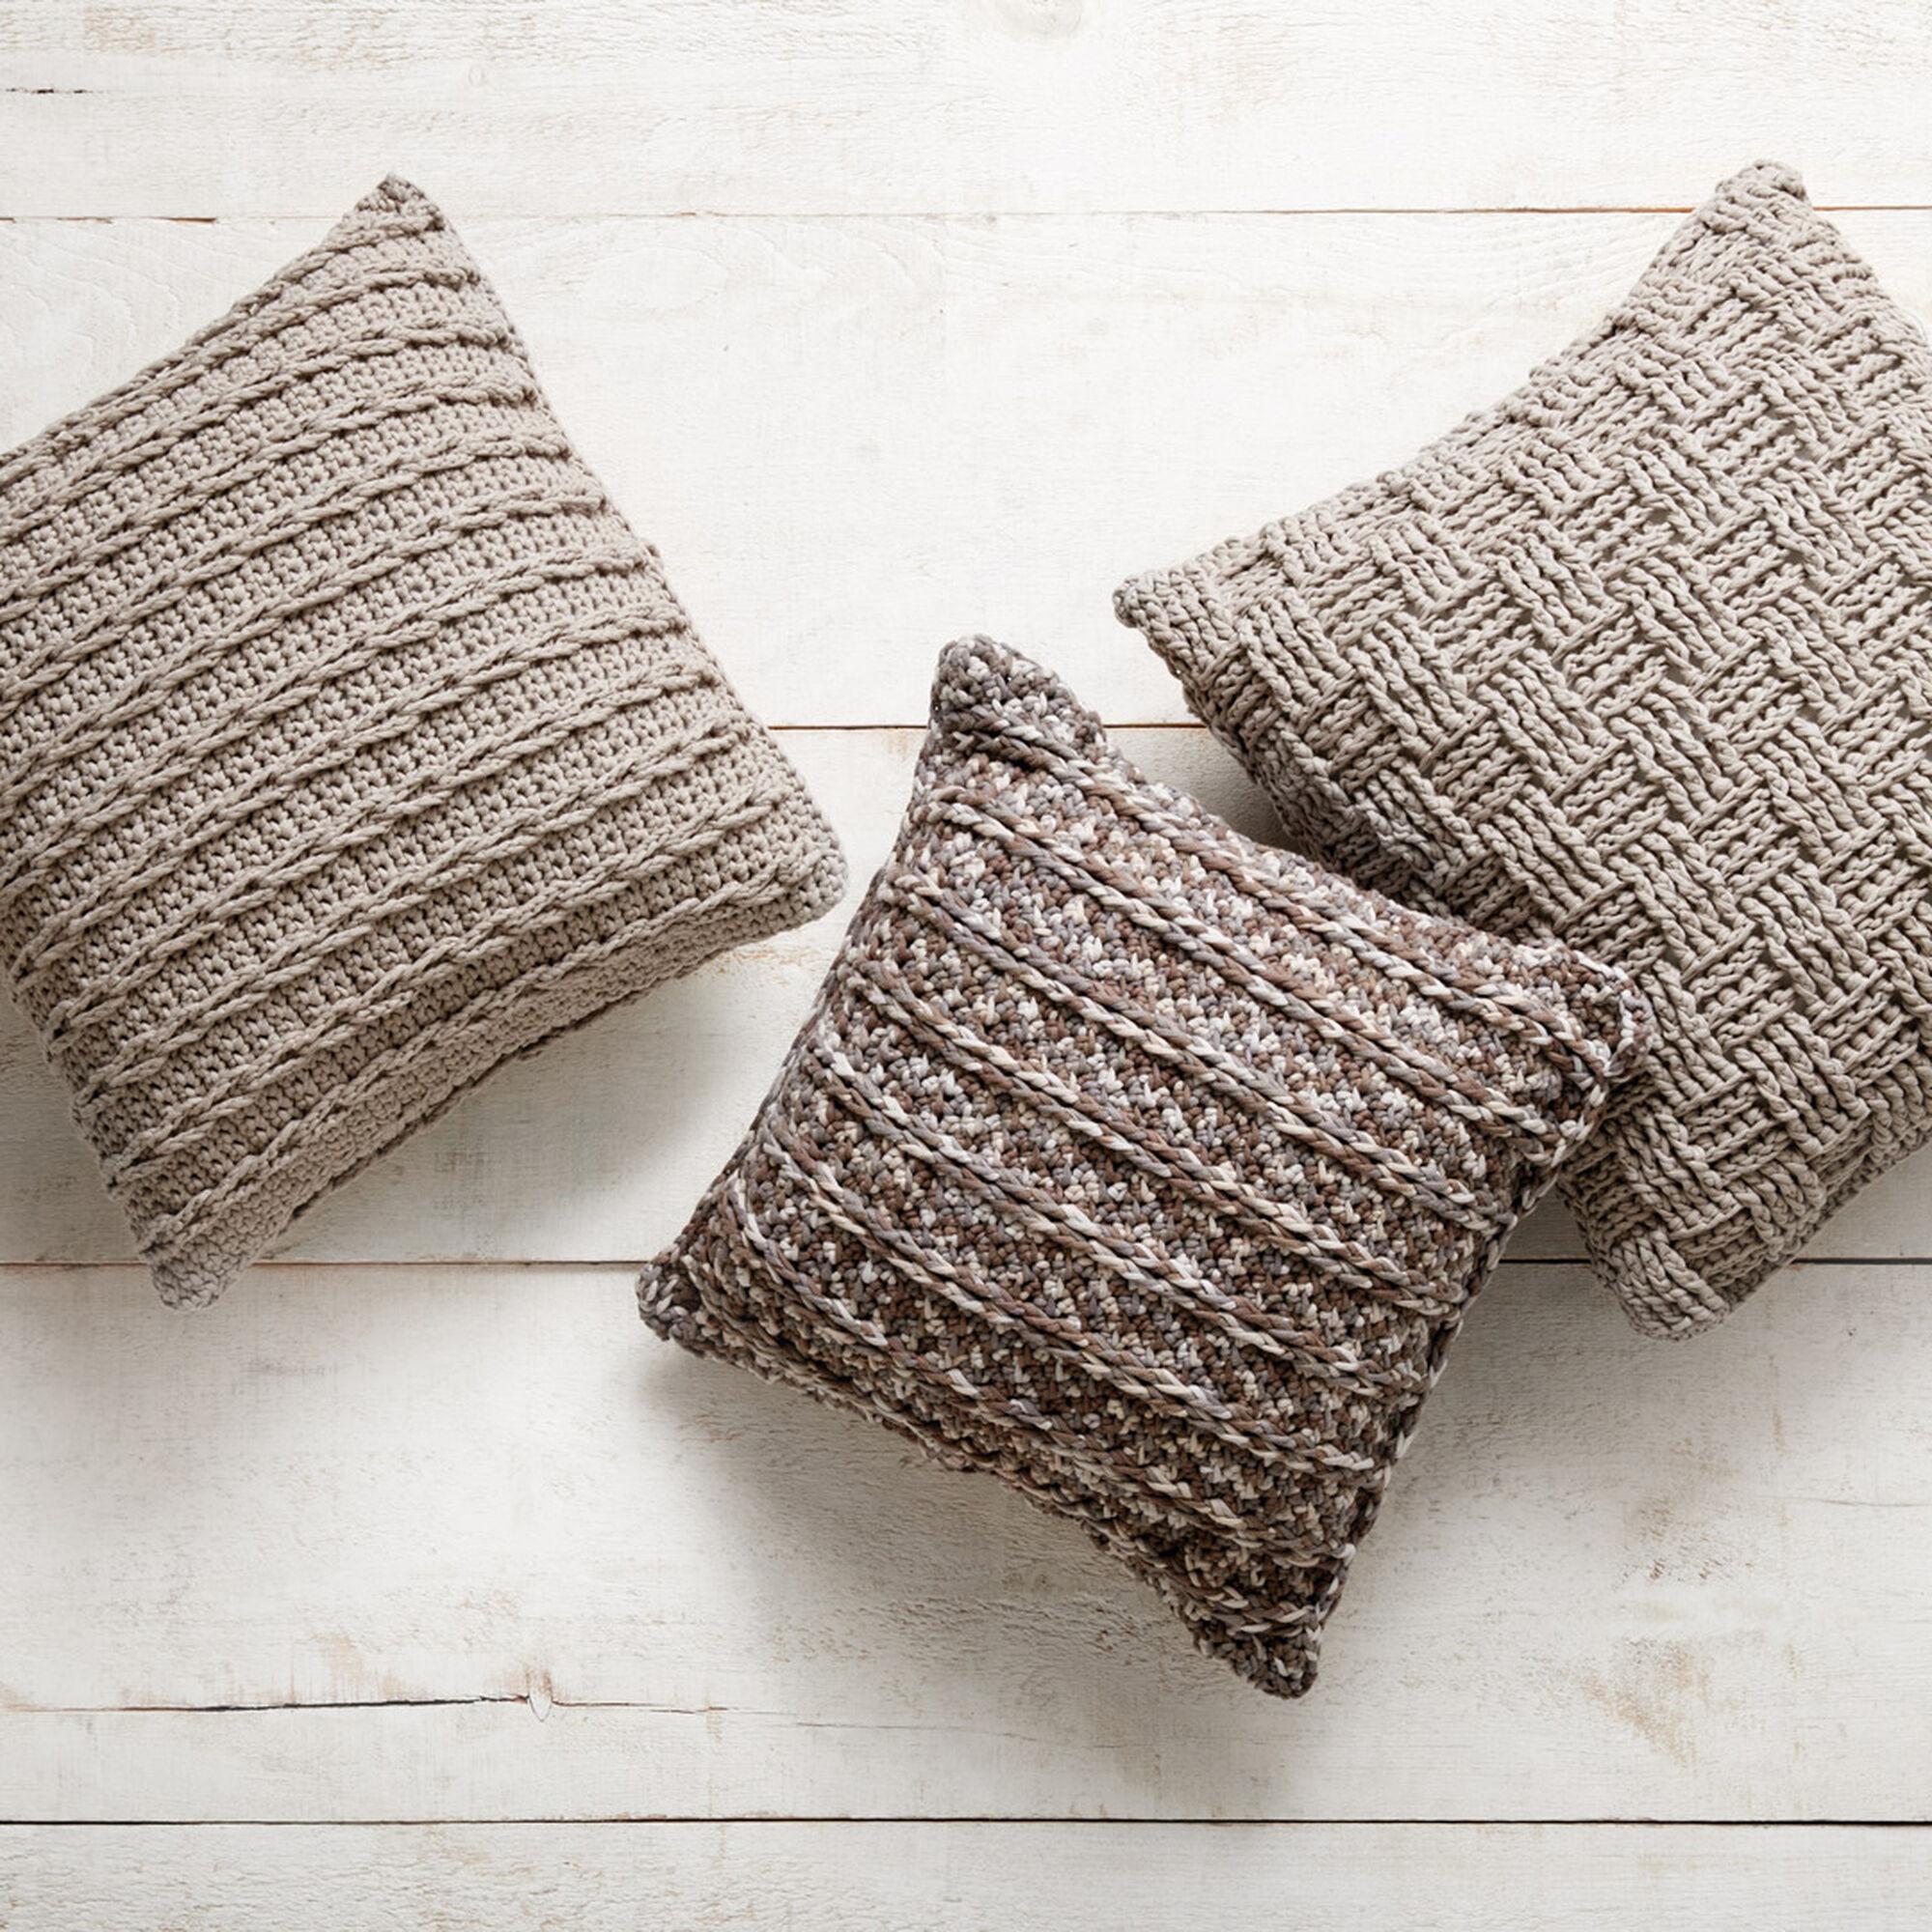 Bernat Crochet Pillow Trio, Vertical Rib | Yarnspirations